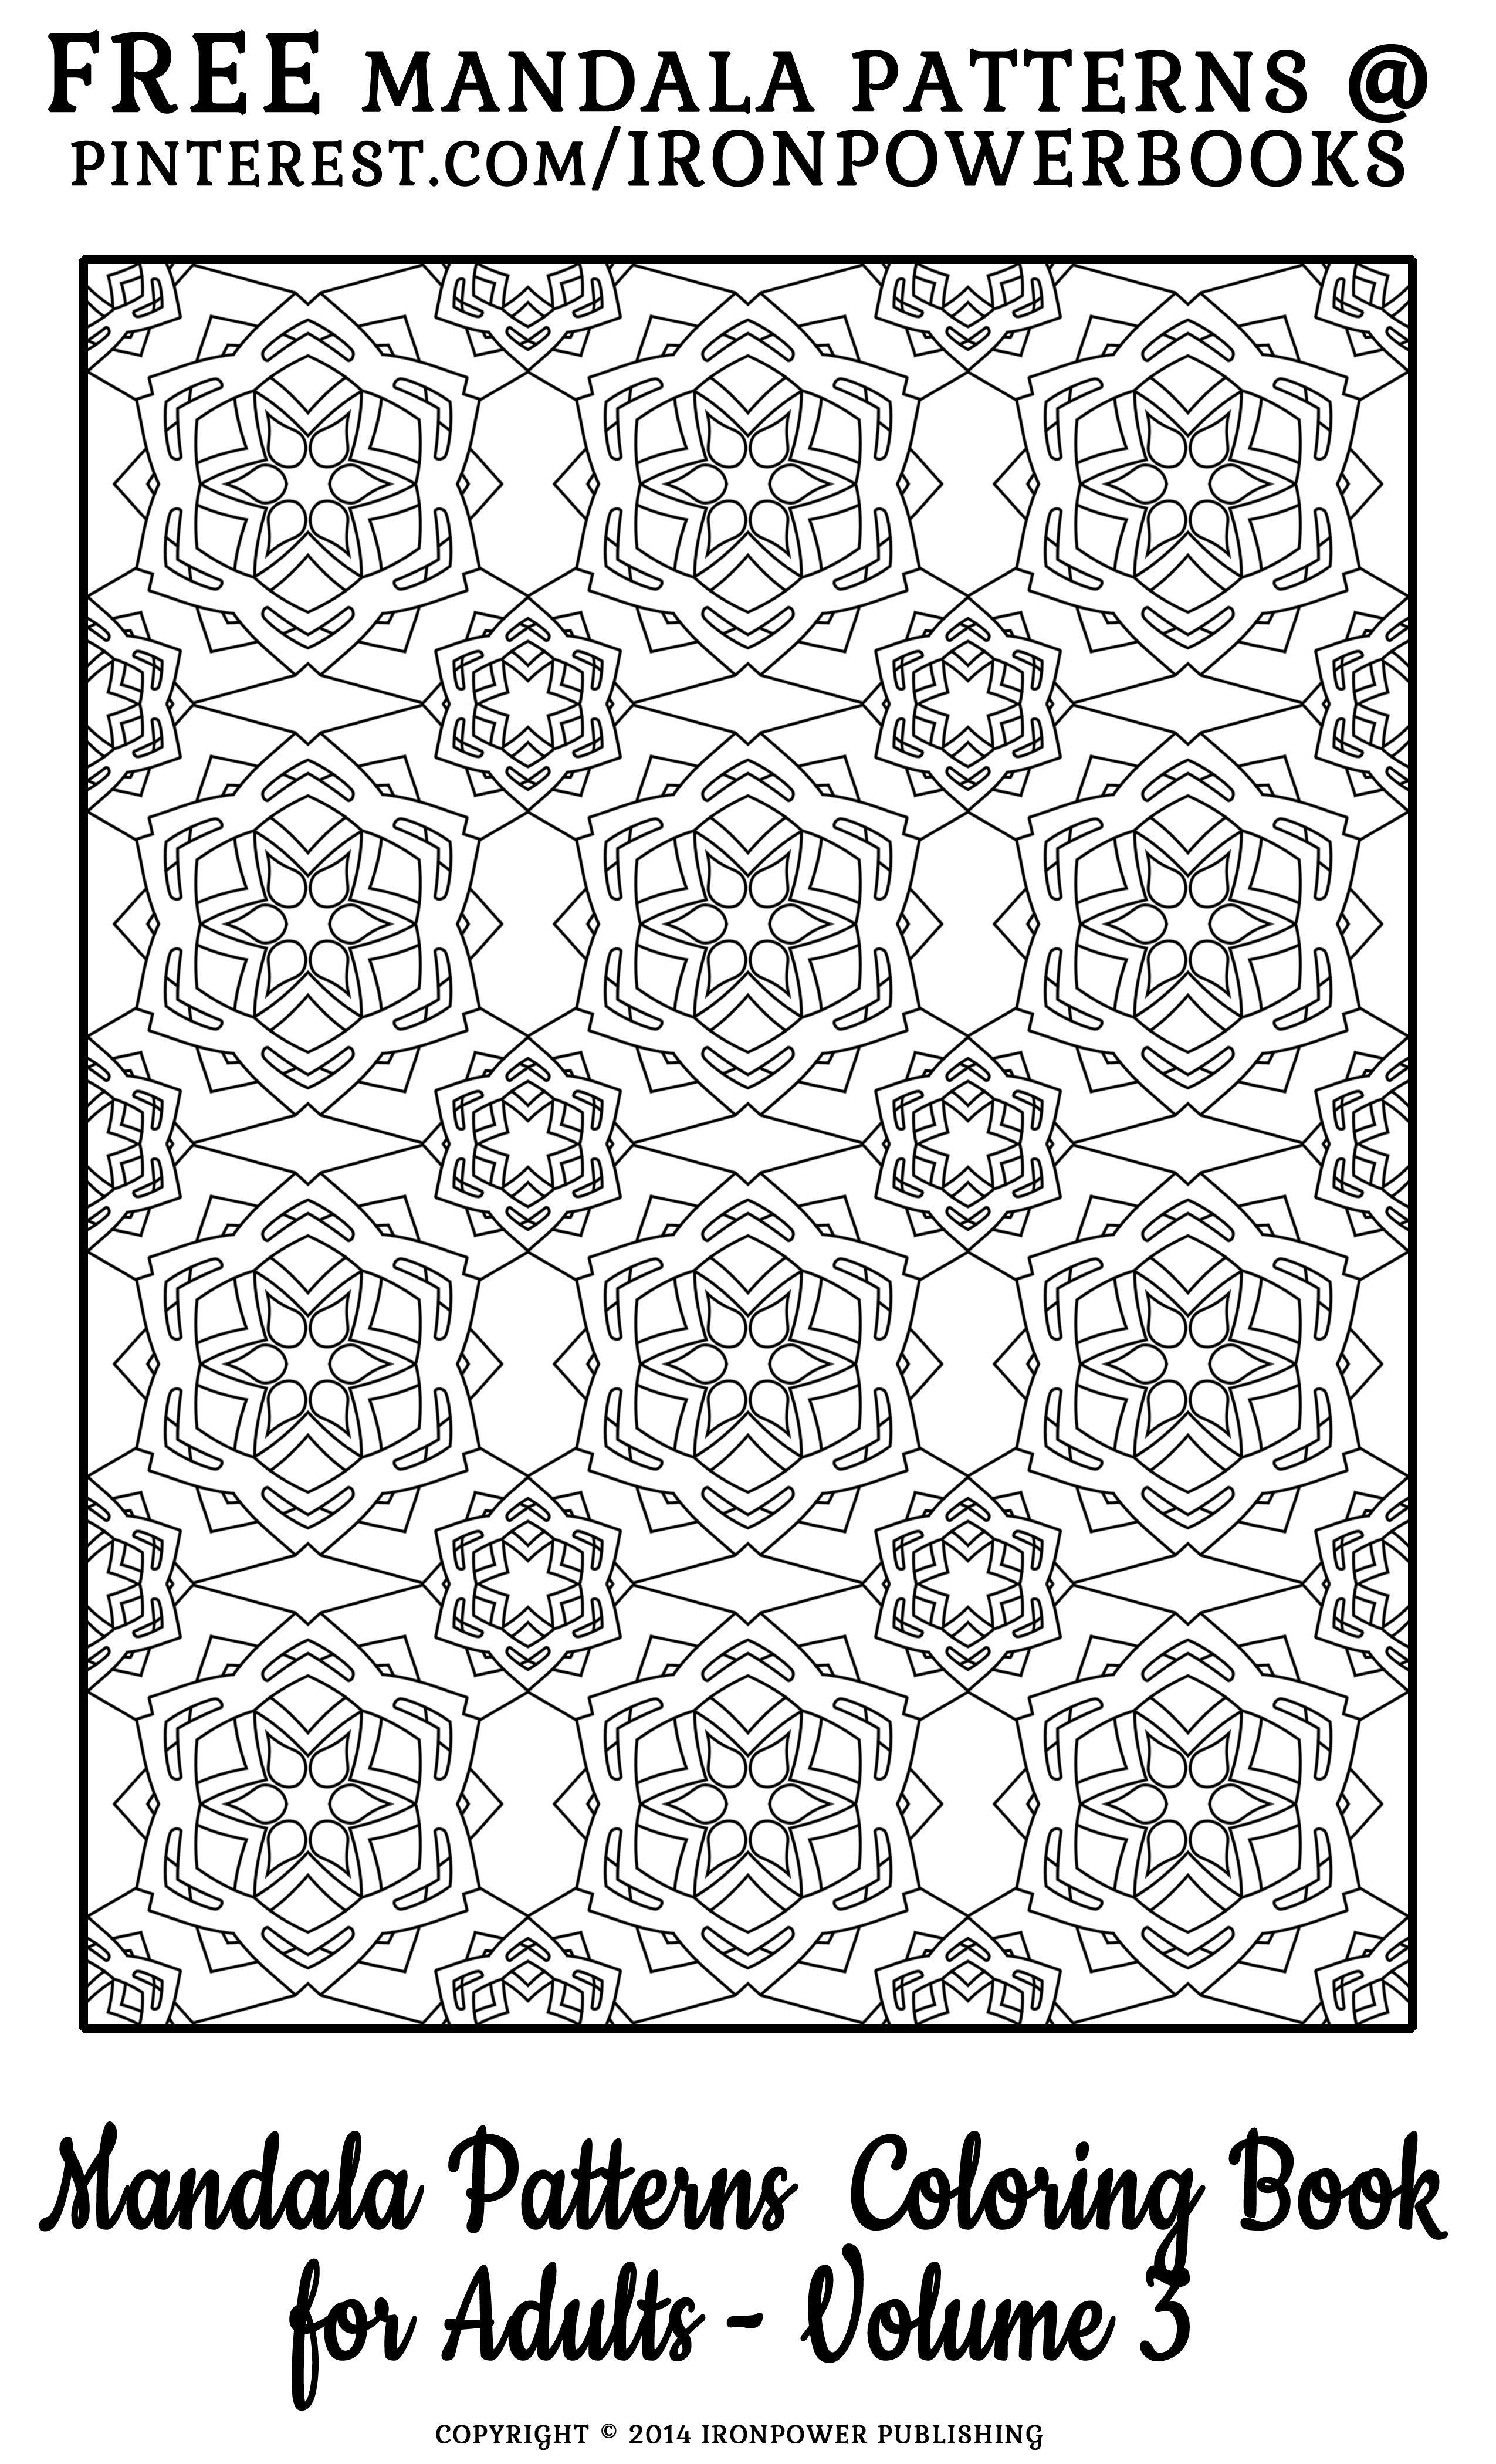 Free Printable Mandala Coloring Pages Here At Pinterest Com Follow